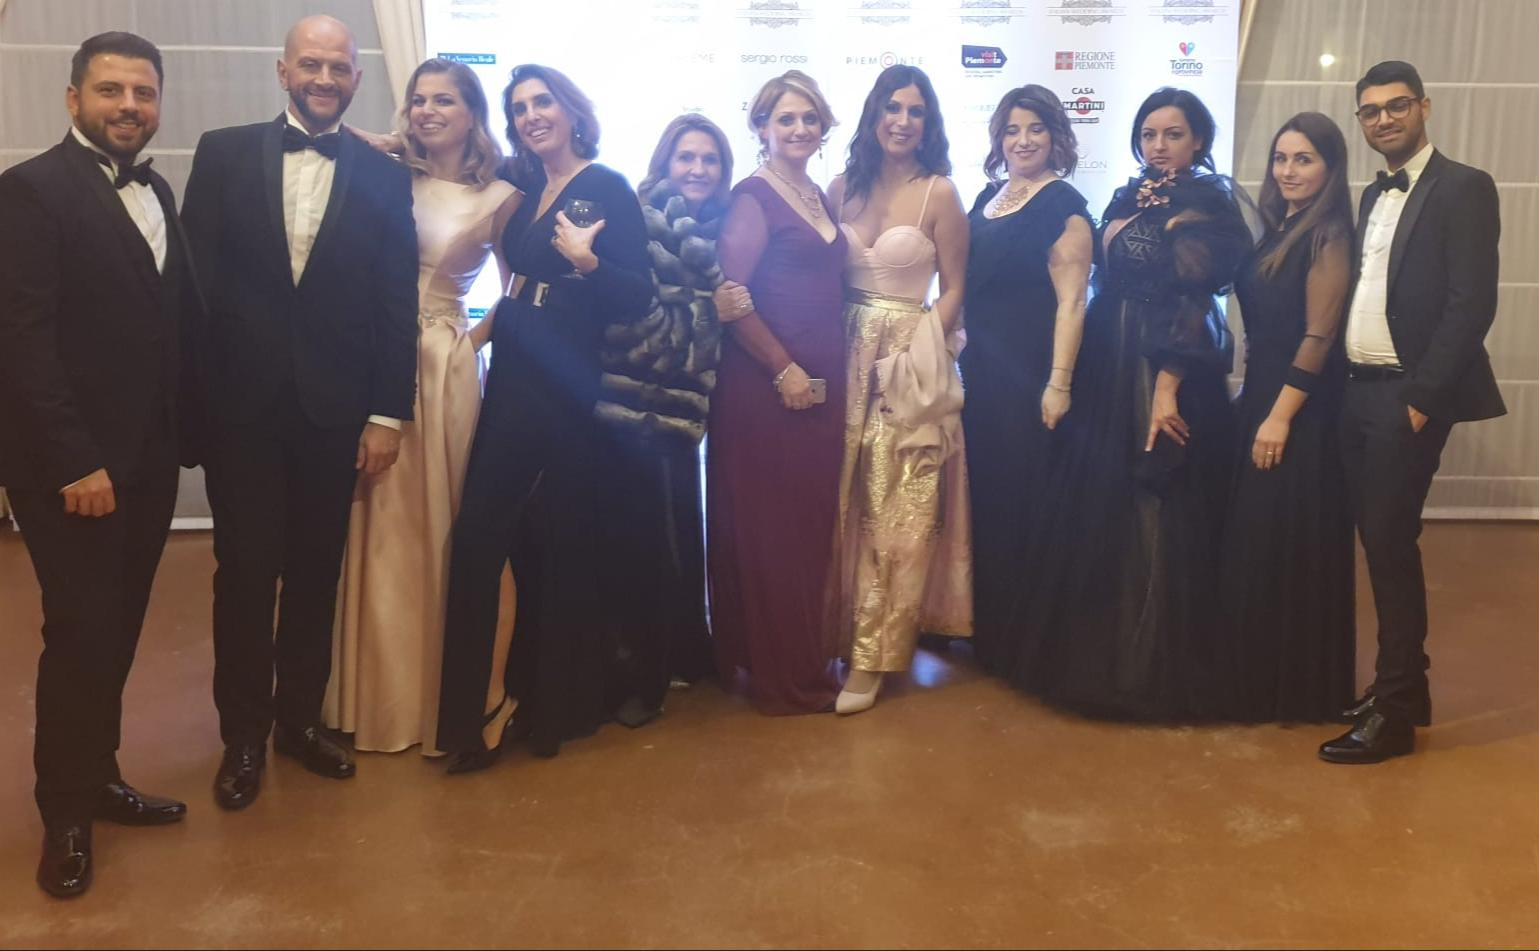 Italian Wedding Awards – Campania protagonista